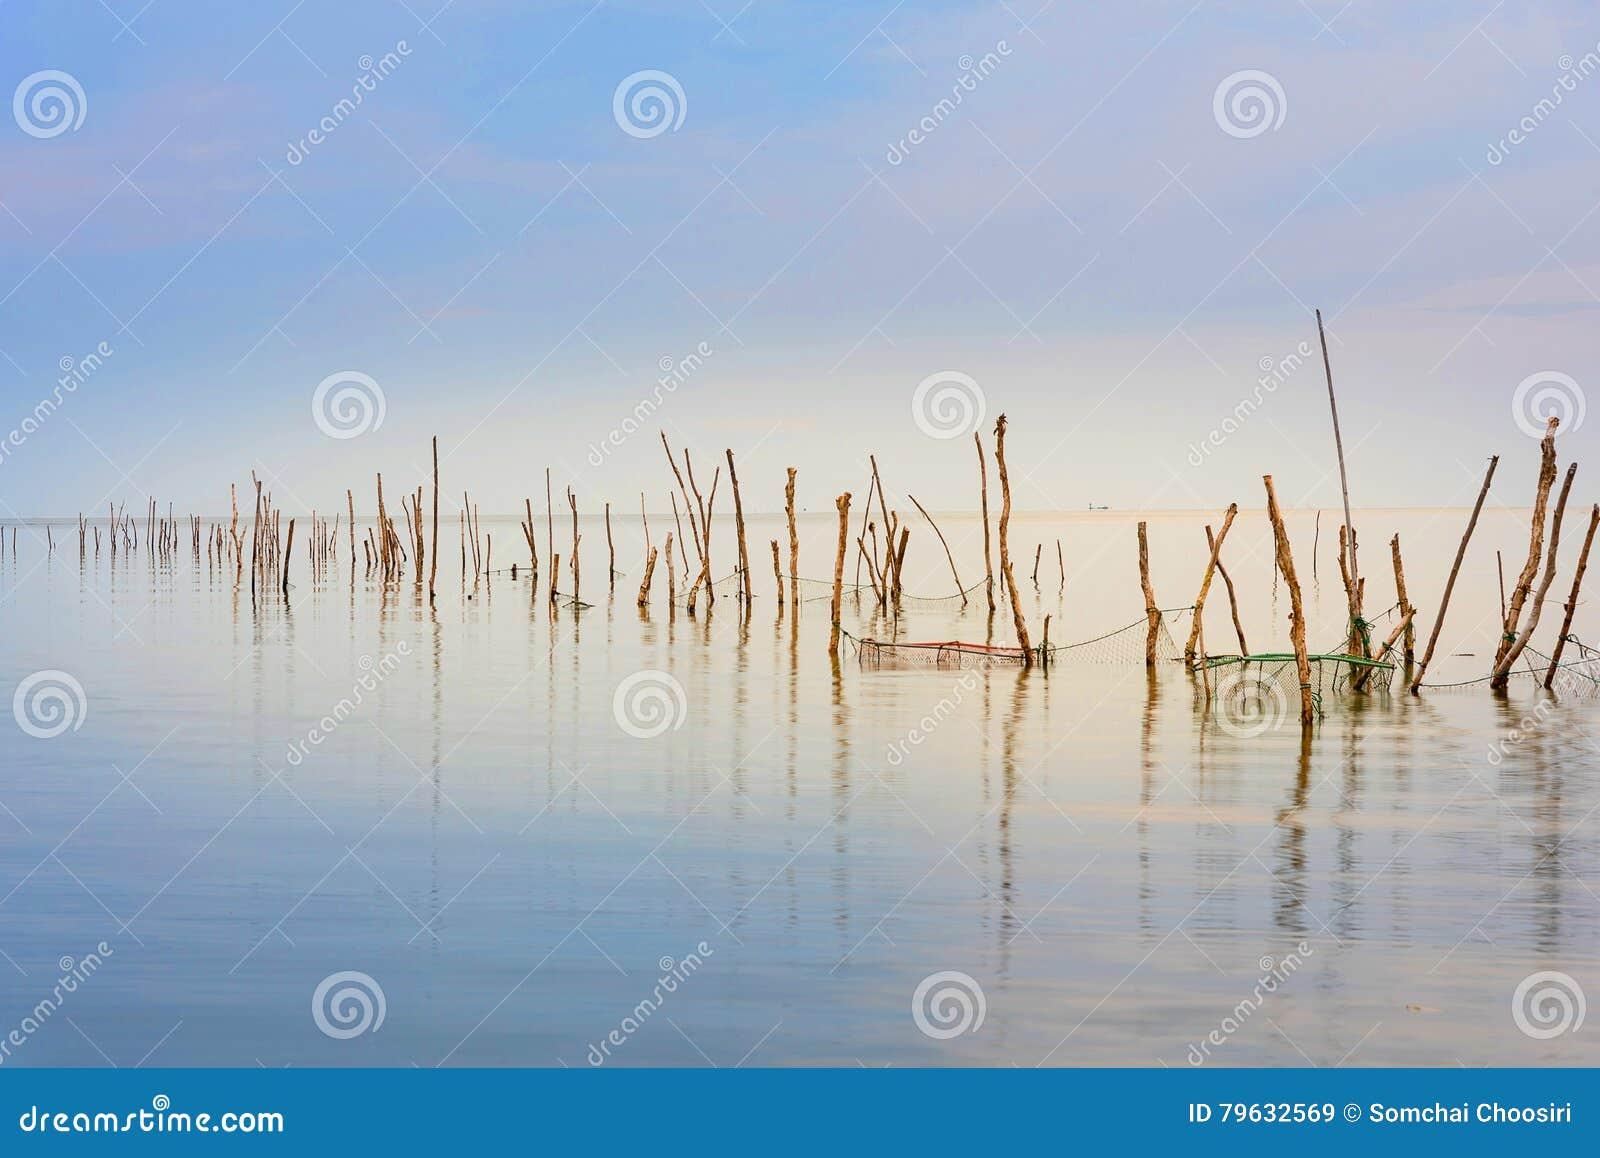 Sjön är tom